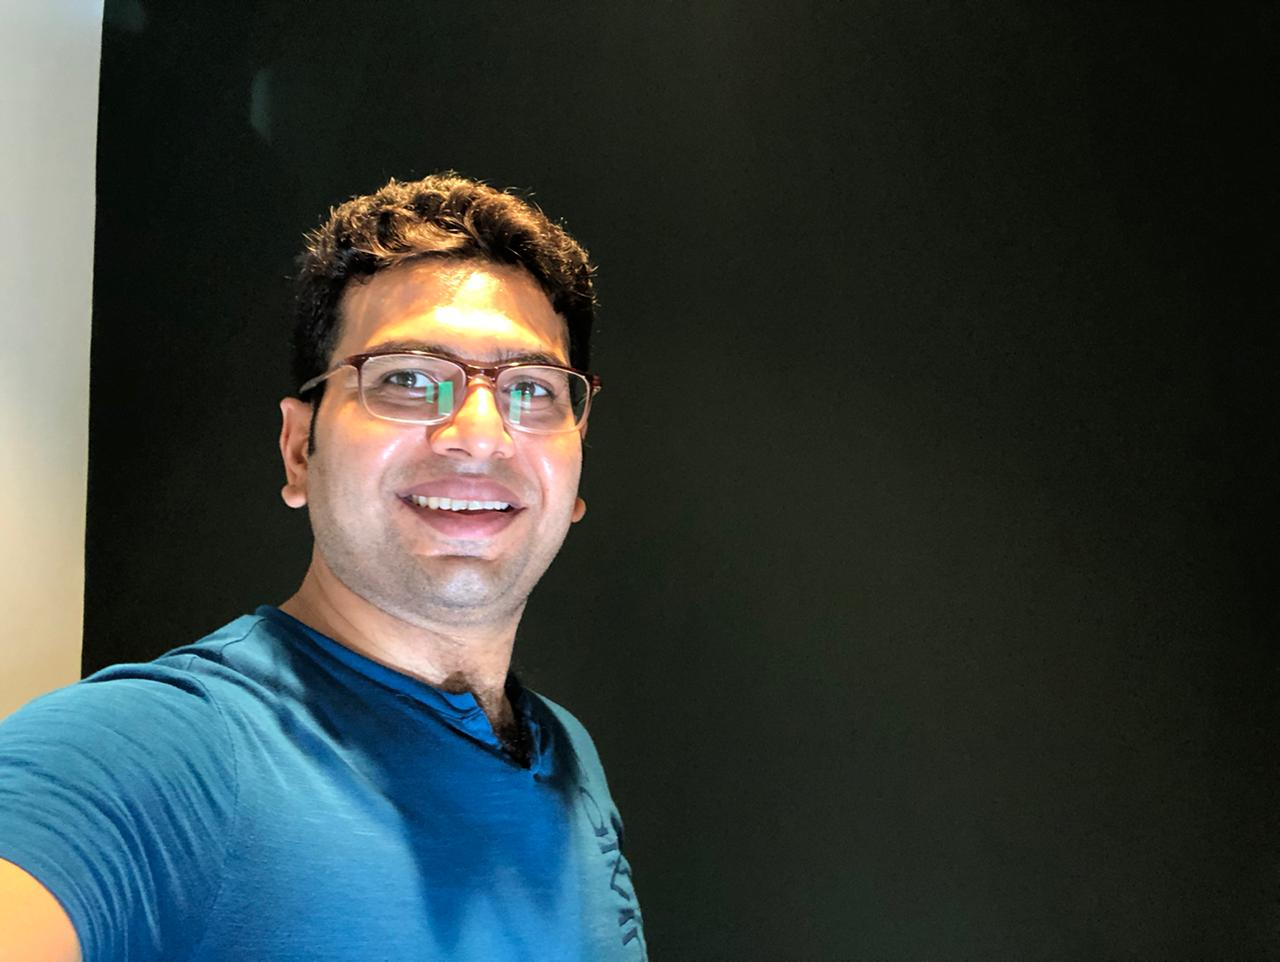 Muhammad Hissaan Awaiz Randhawa